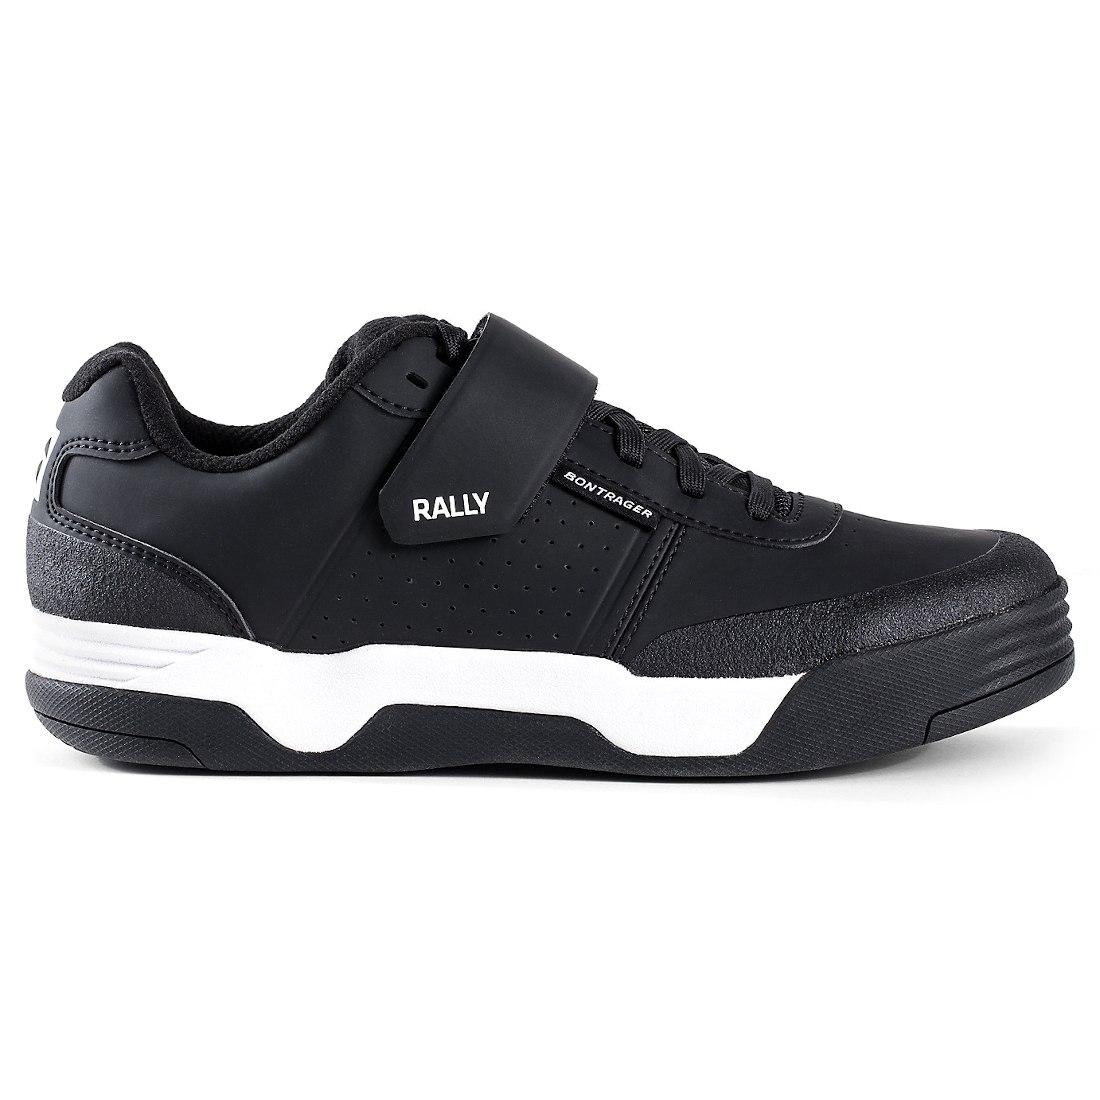 Bontrager Rally MTB Shoe - black